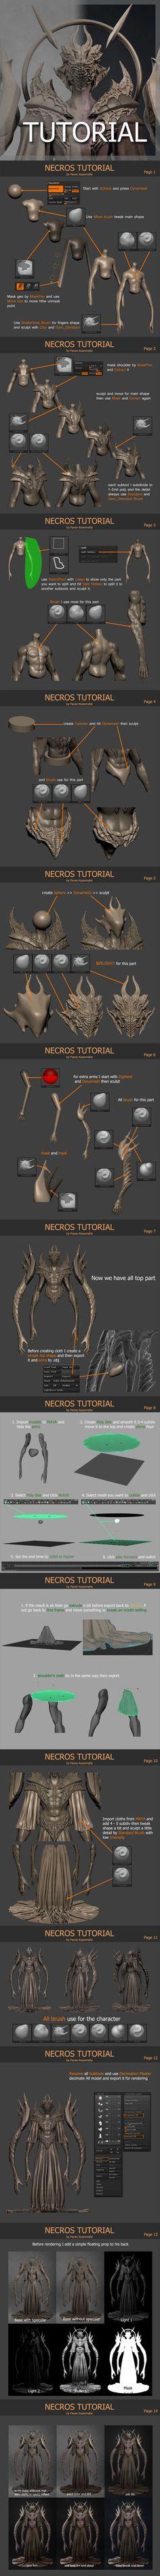 Necros [Tutorial] by Khempavee